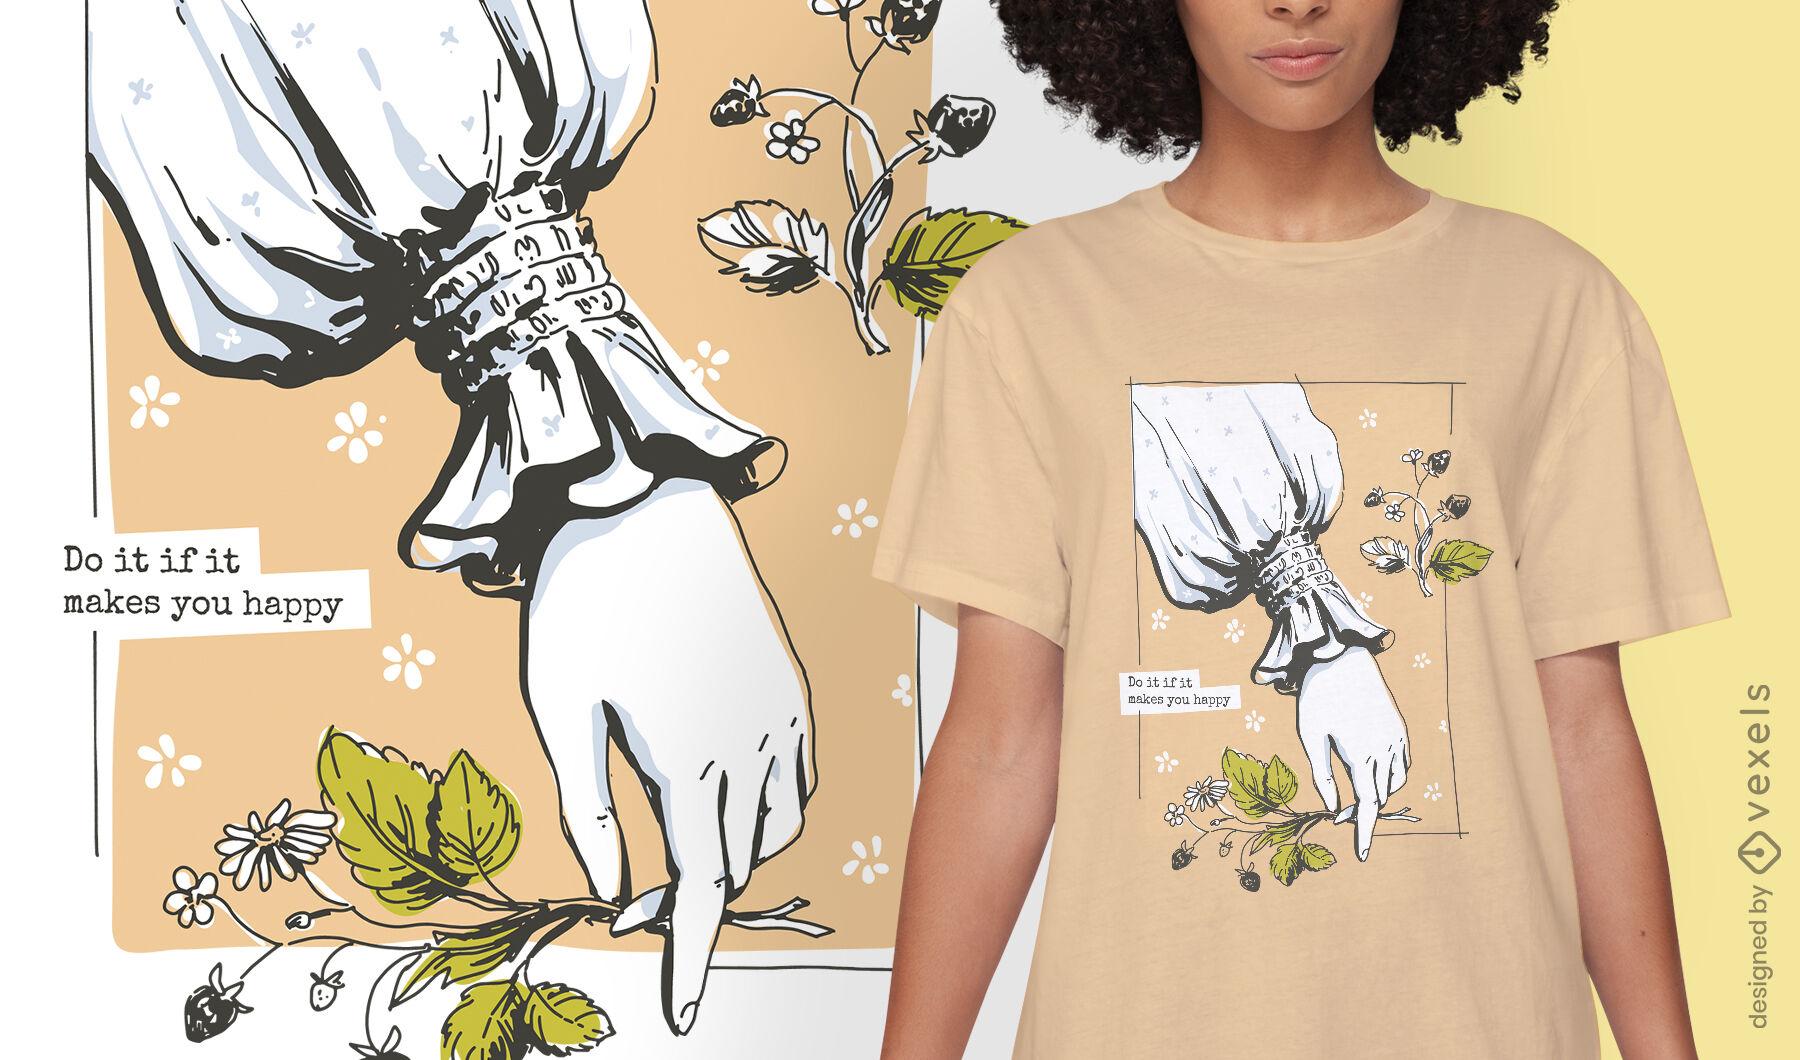 Cottagecore lifestyle nature t-shirt design